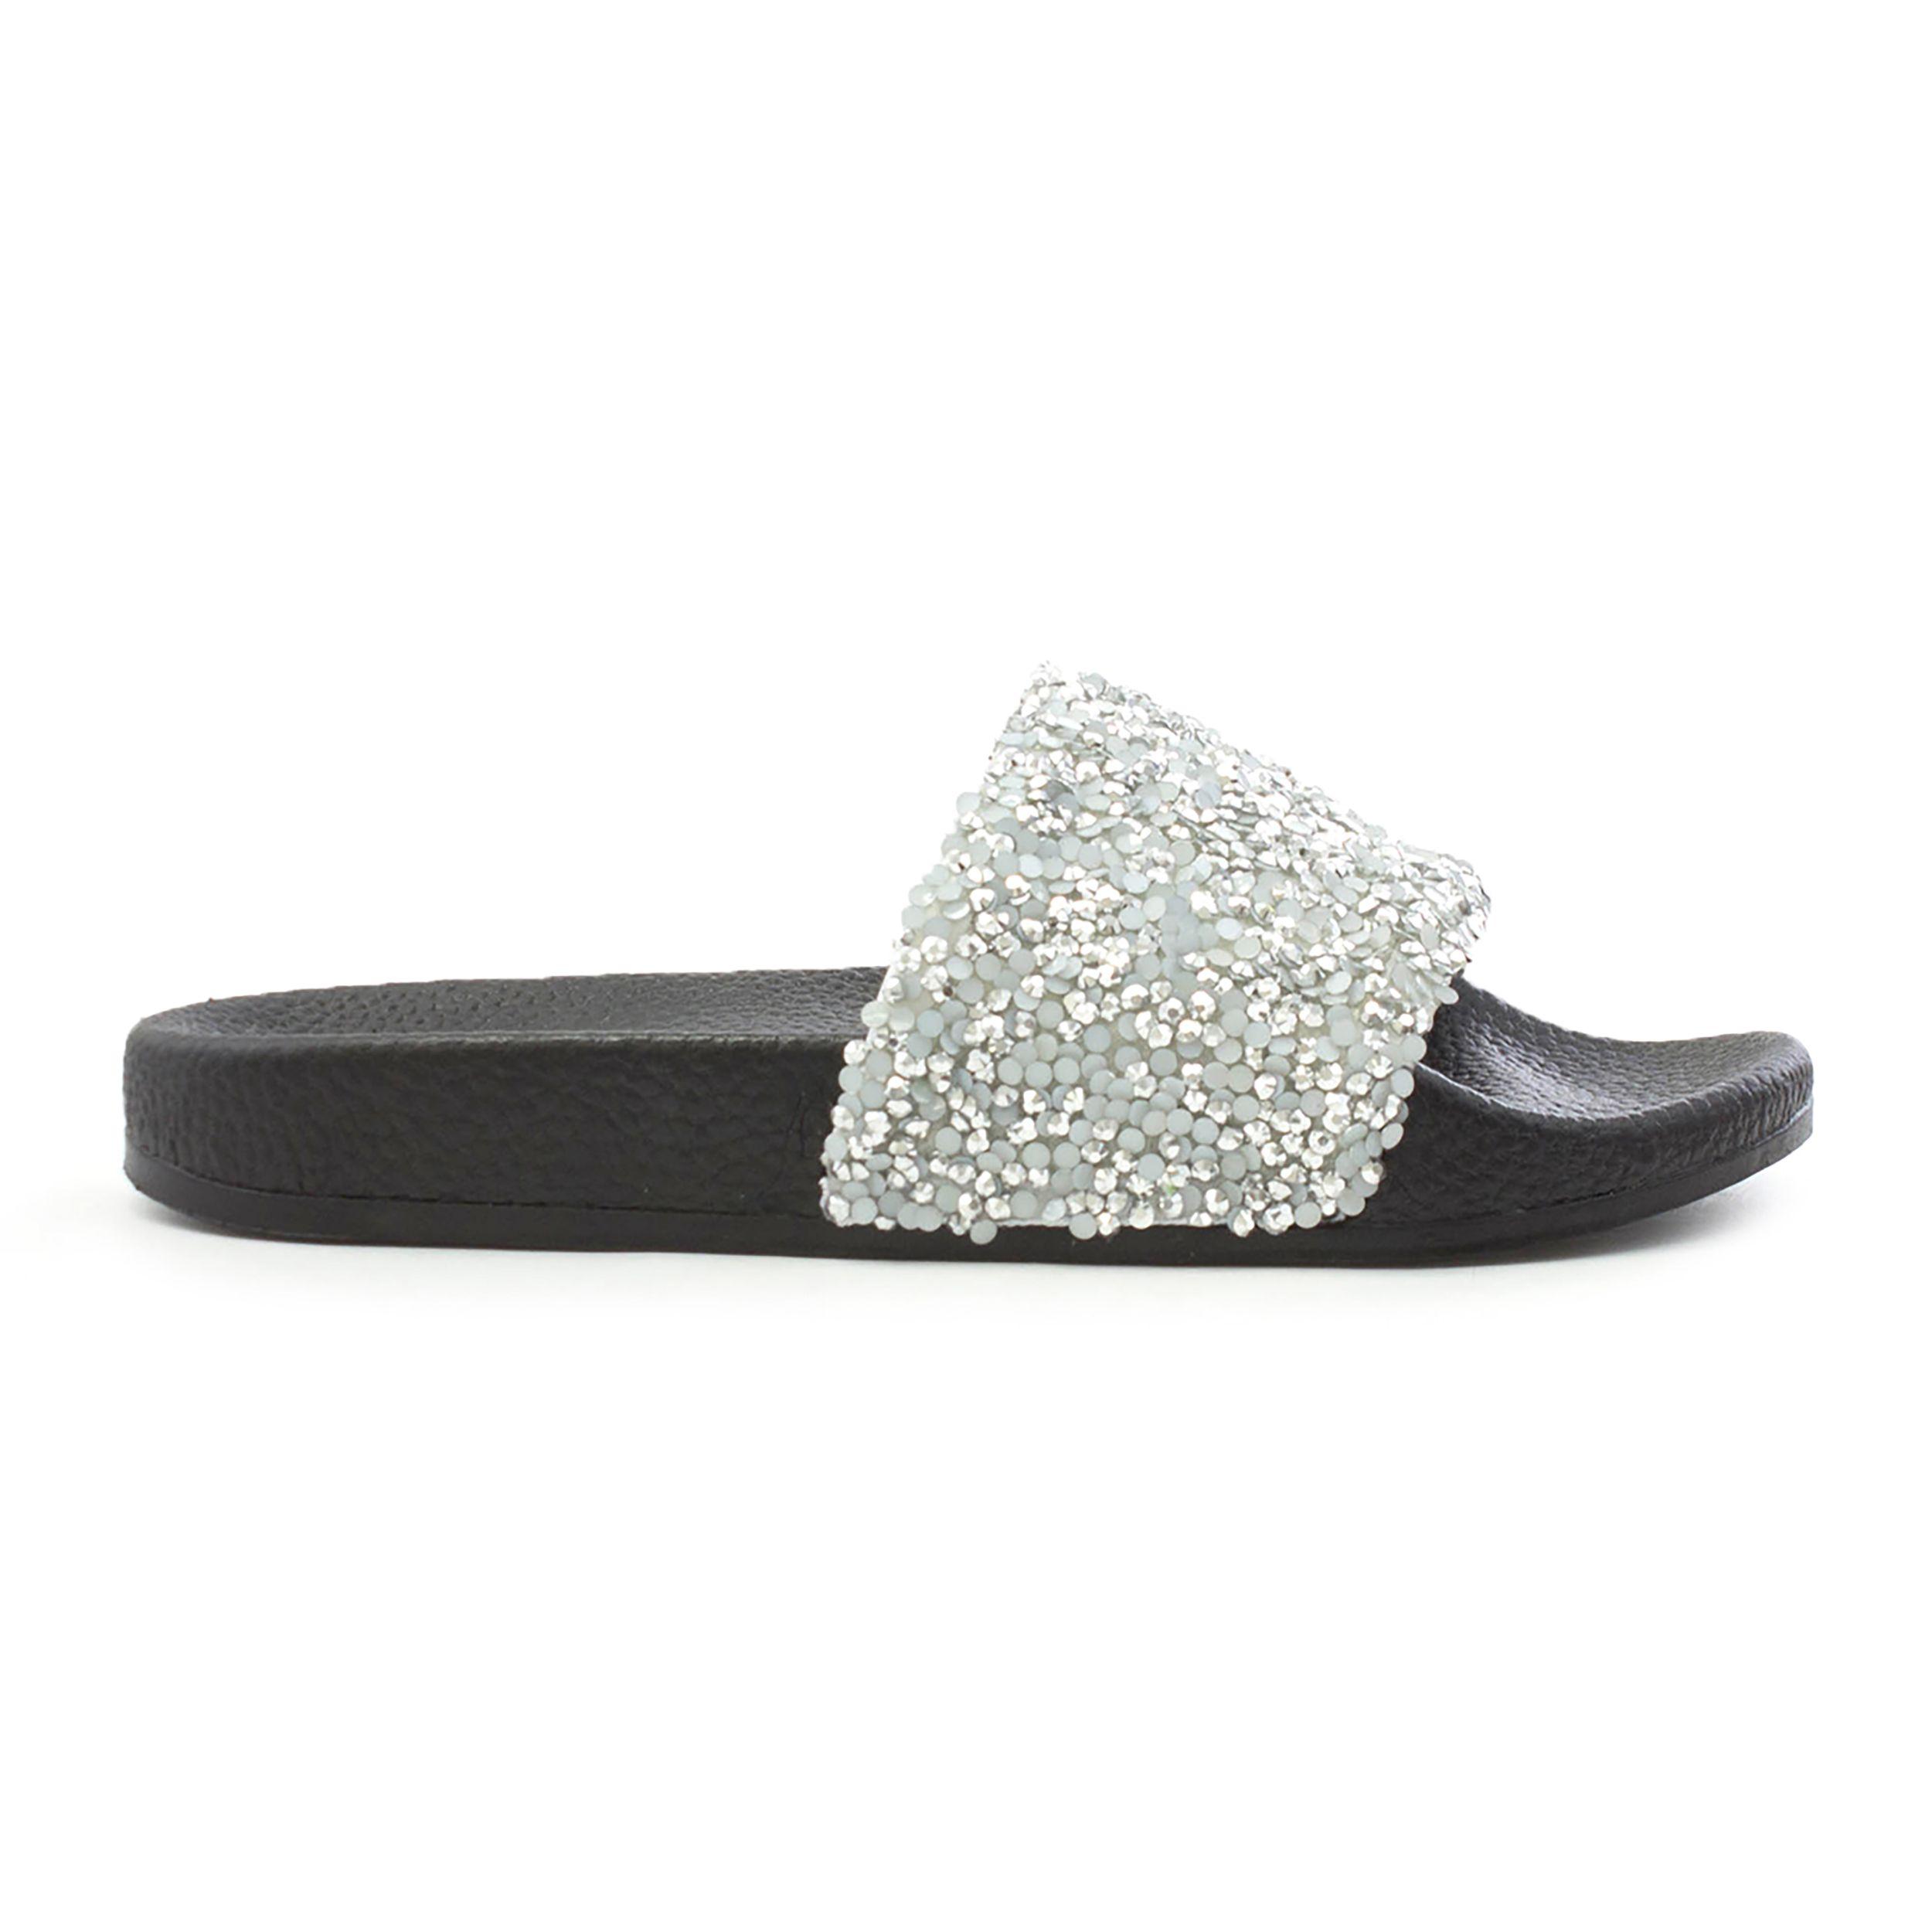 9e4052b0f1a5 Lilley Womens Silver Sequin Slip On Slider